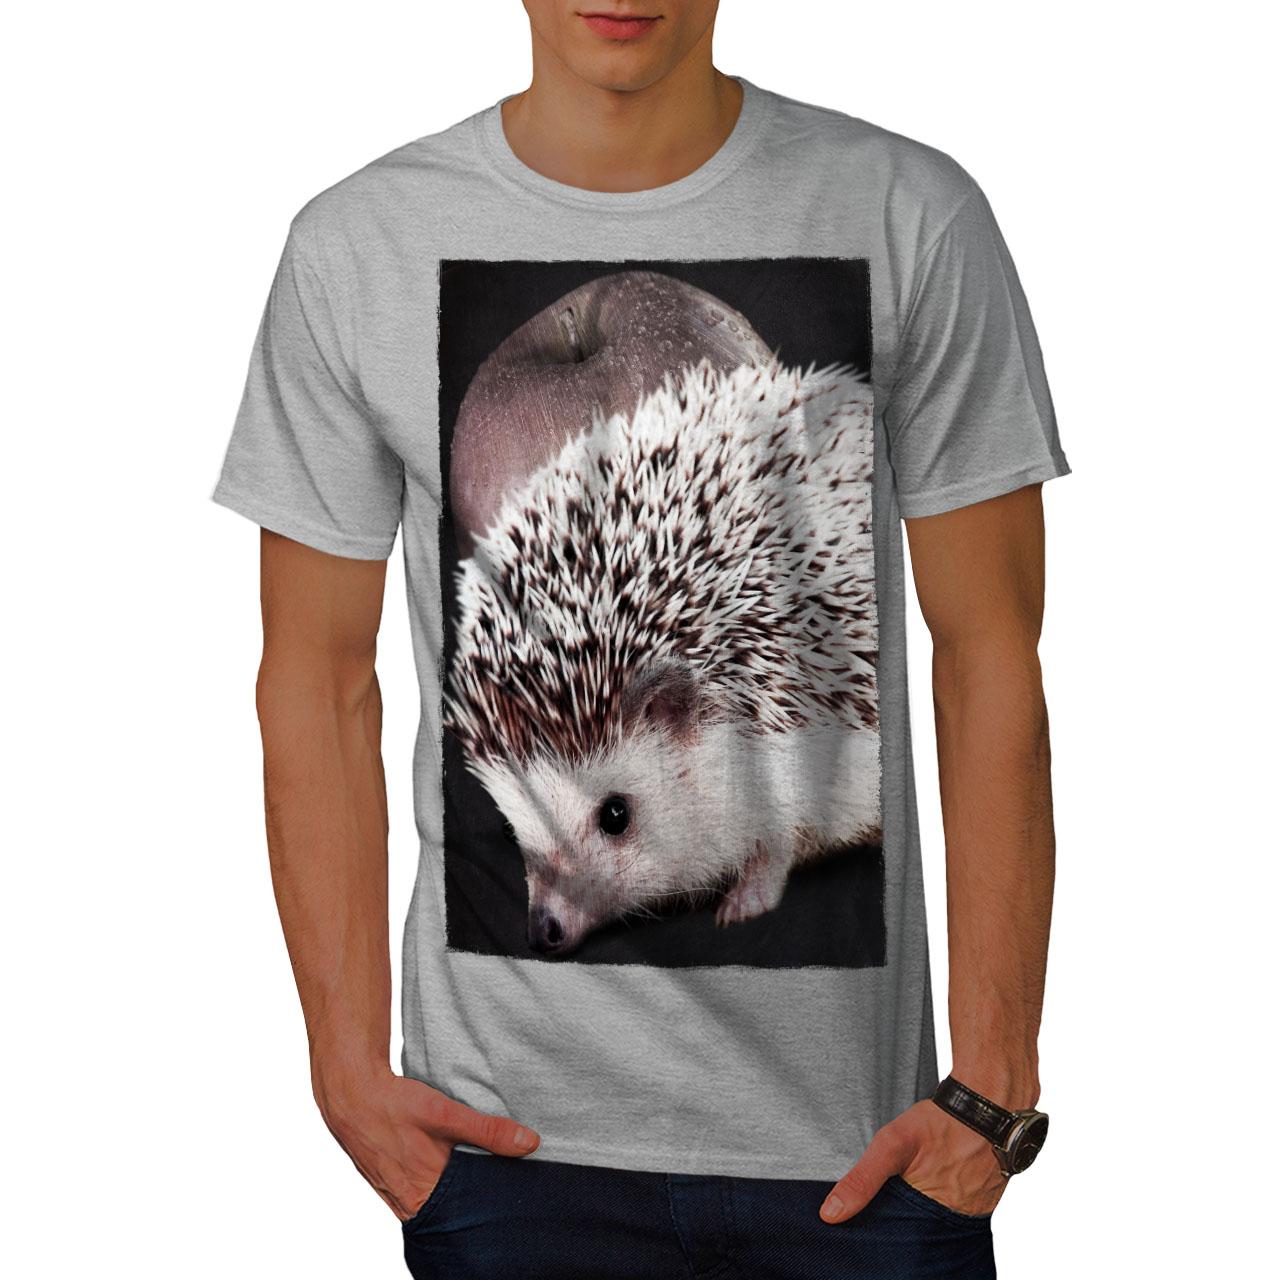 Wellcoda Hedgehog Apple Fun Womens T-Shirt Cute Graphic Style Design Tee